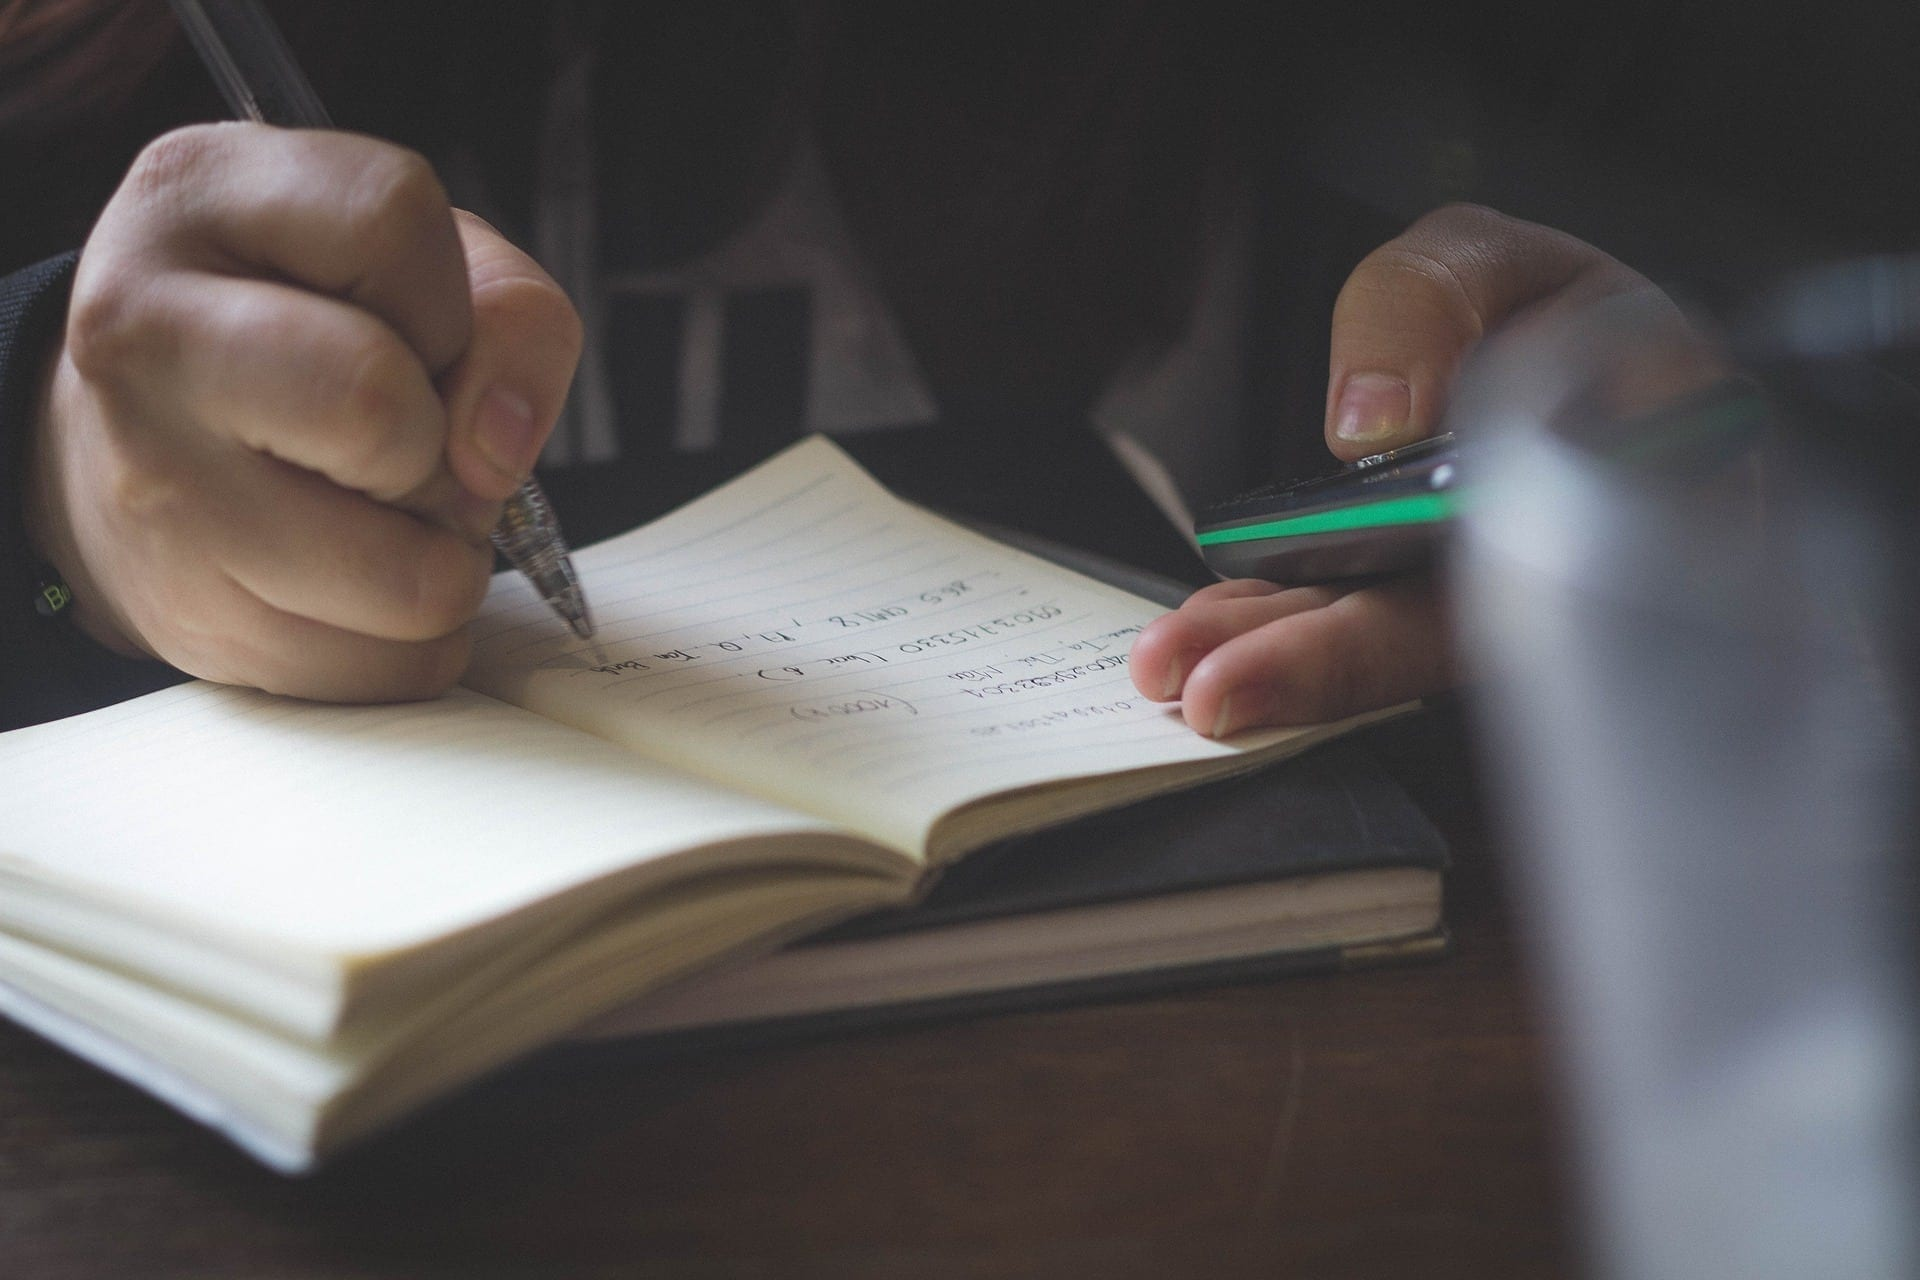 Acabar com a preguiça de estudar